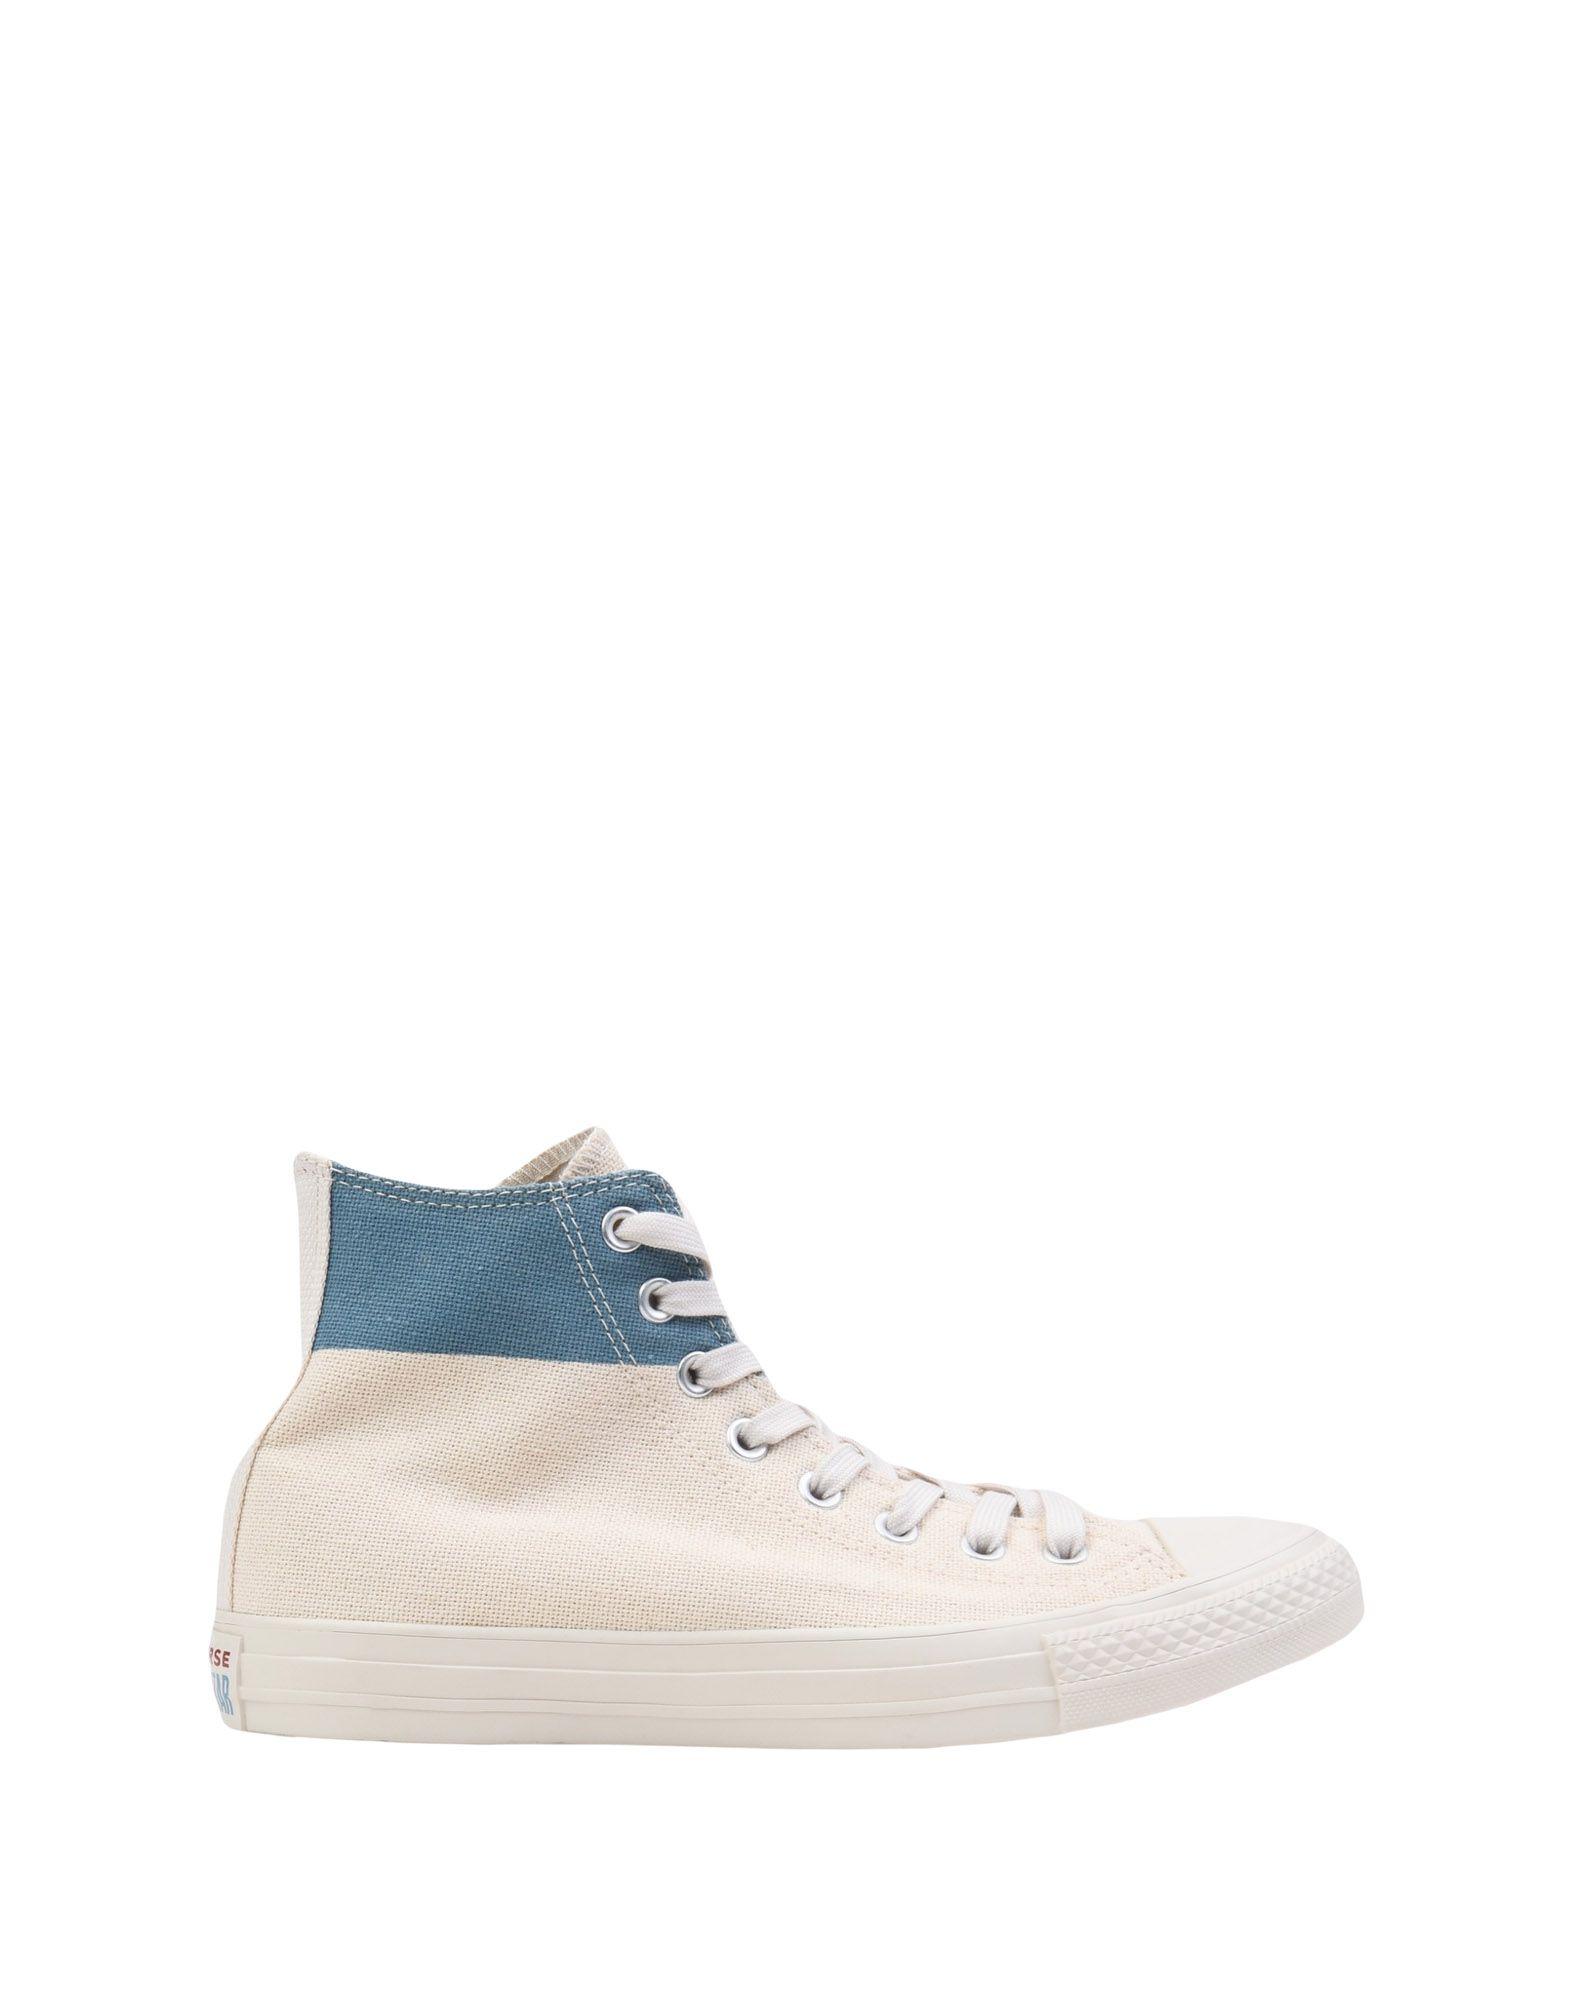 Rabatt echte Schuhe Converse All Star Chuck Taylor All  Star Hi Americana Block  All 11511245BQ 4dcb3c